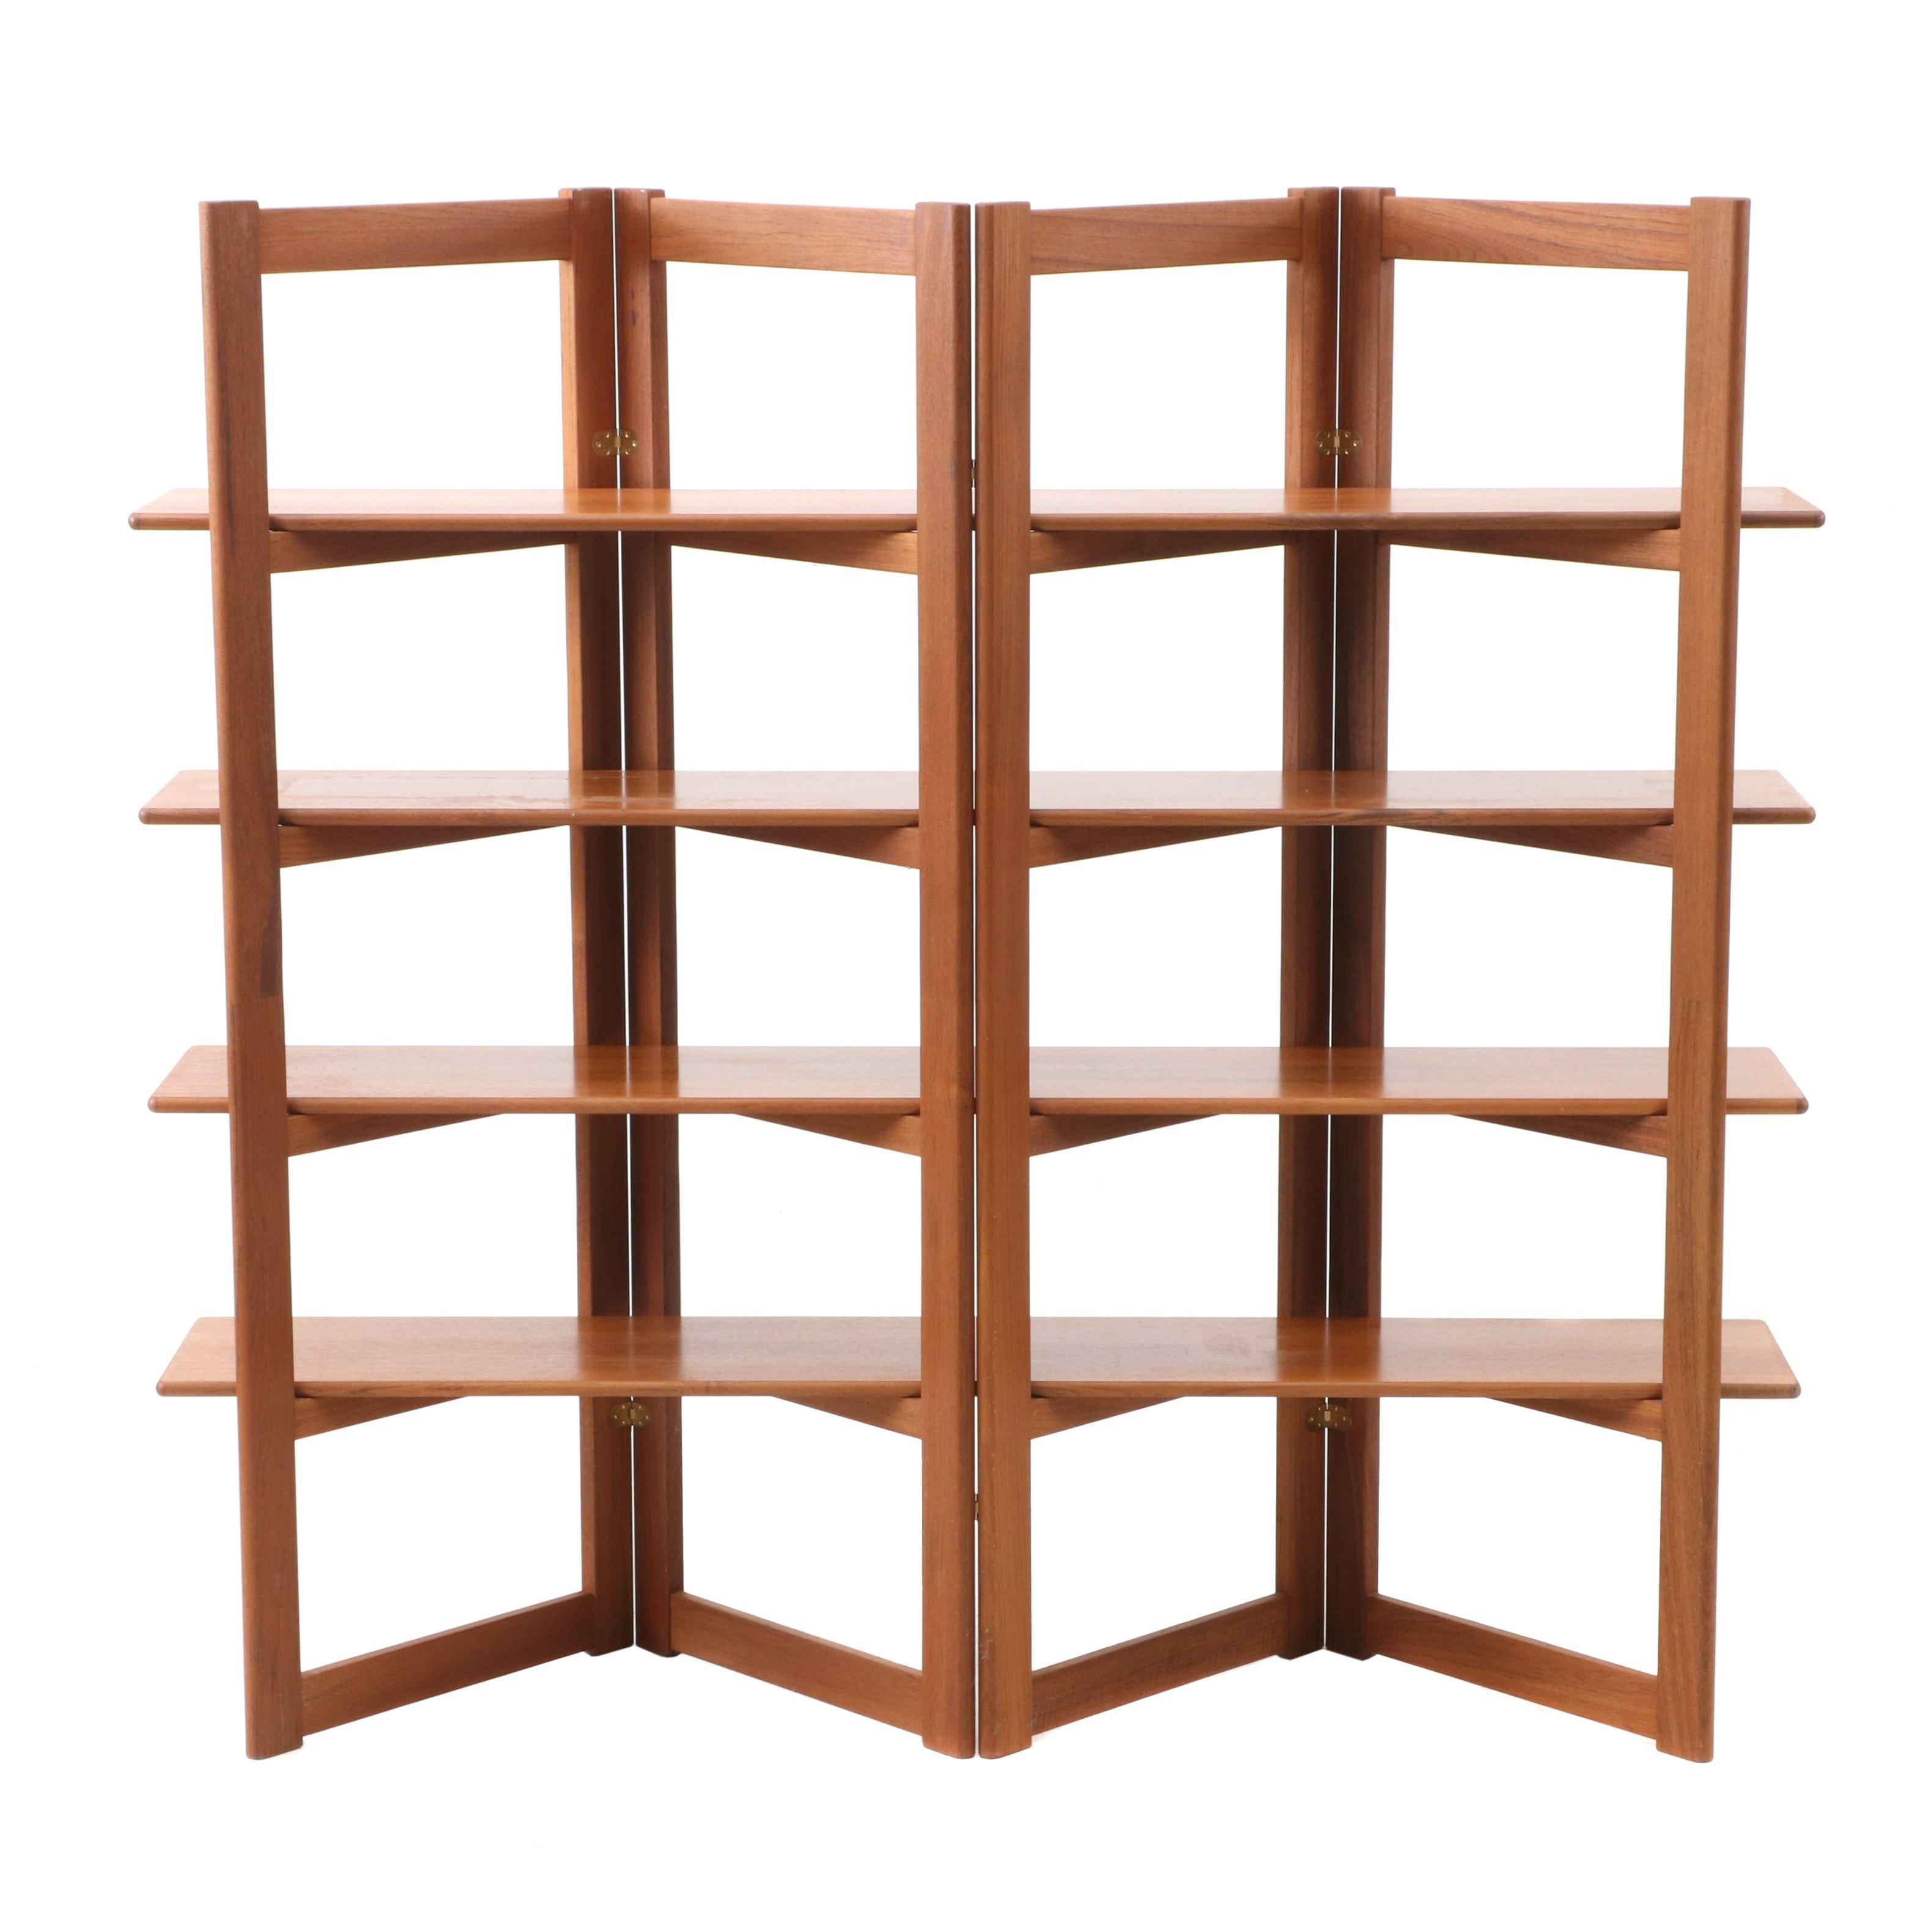 Contemporary Wood Folding Screen Bookshelf